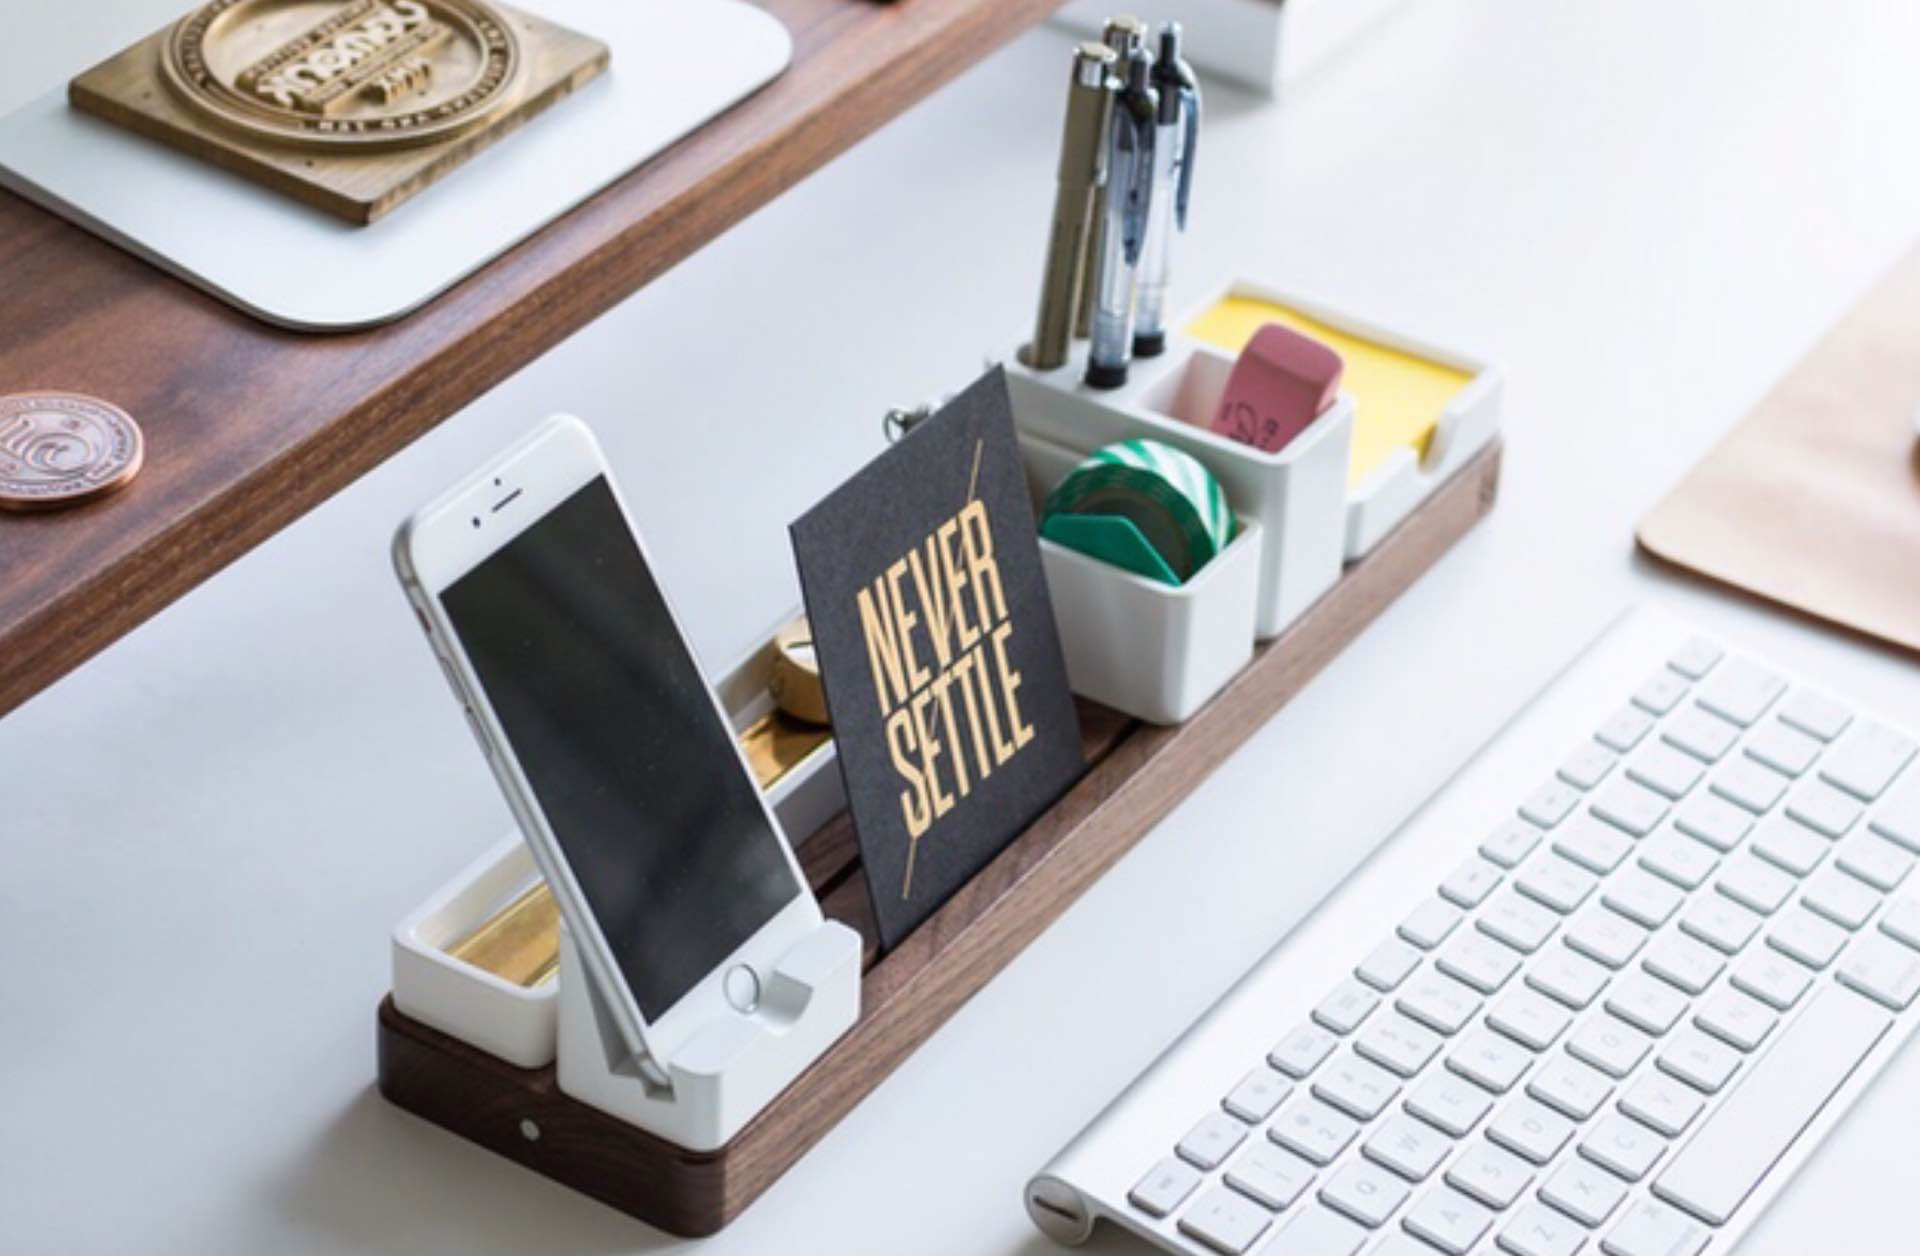 ugmonk-gather-desk-organizer-kickstarter-3